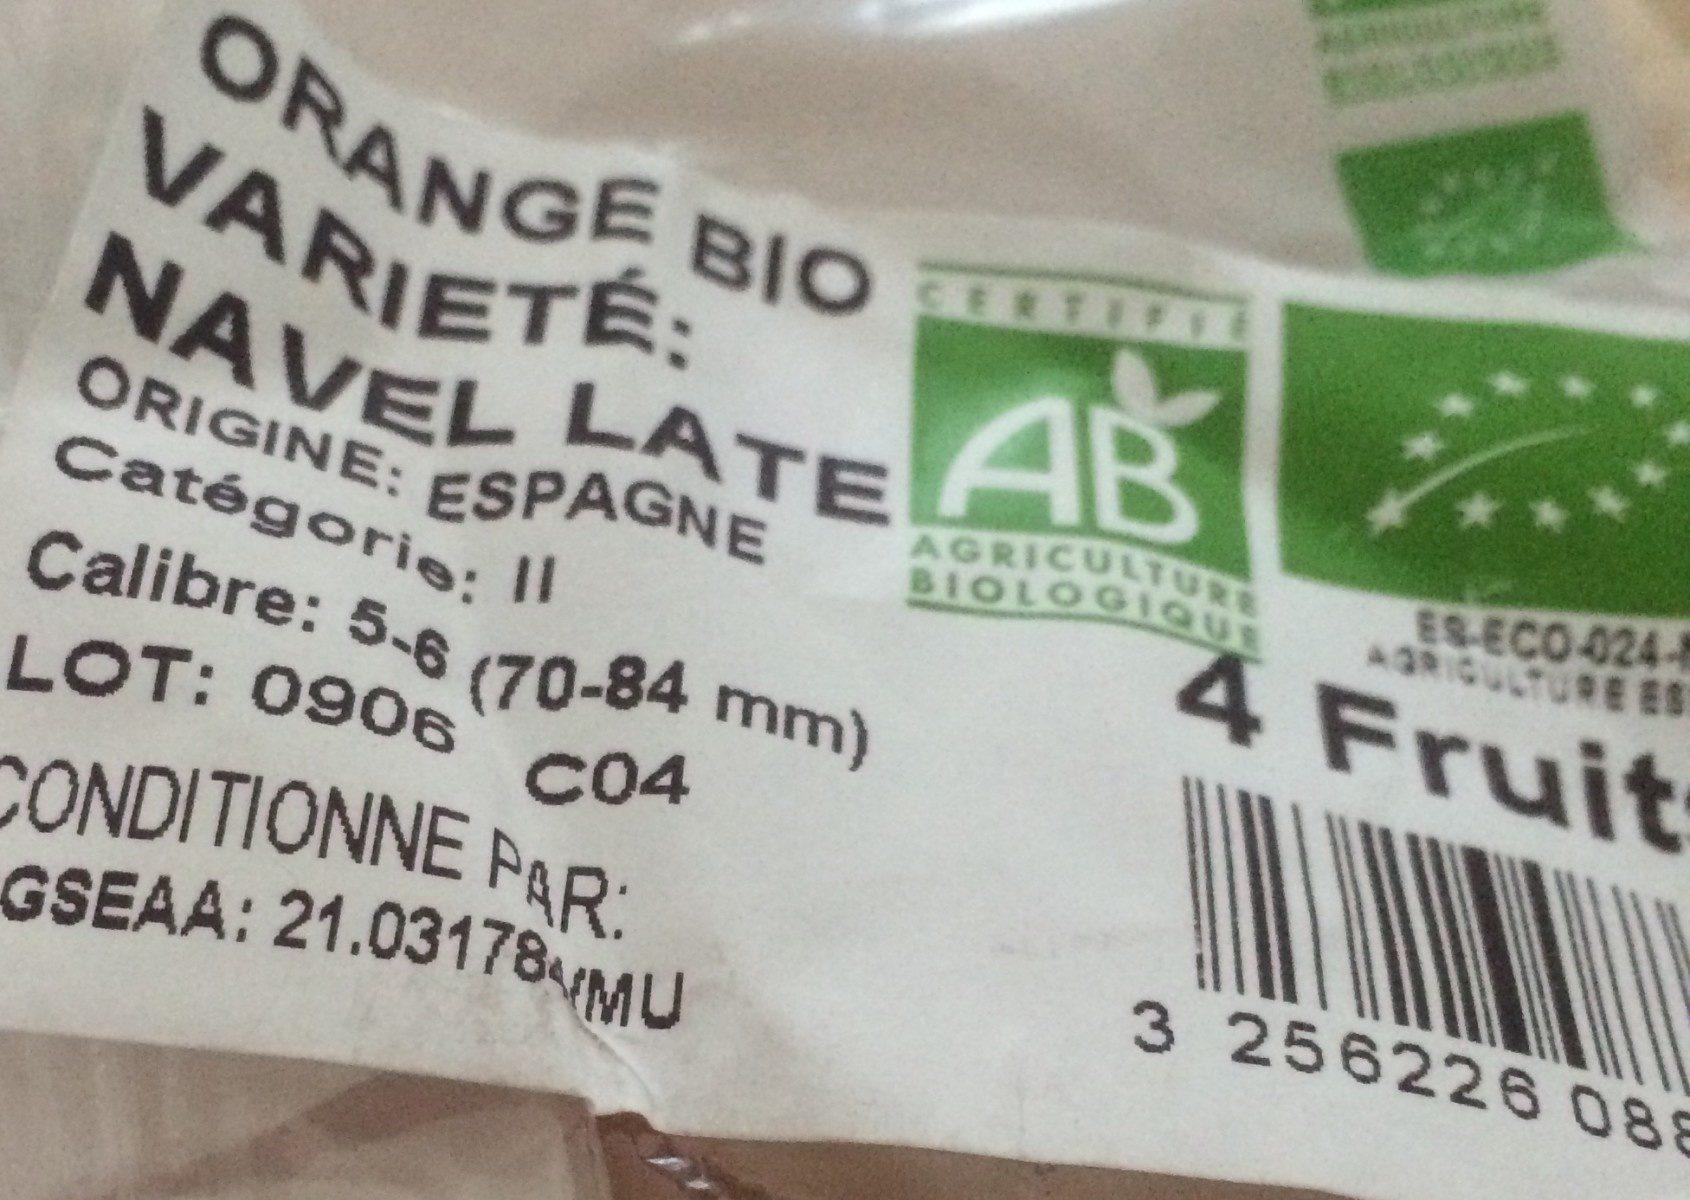 Orange Navelate, 4 fruits calibre 5/6 catégorie 2 - Ingrediënten